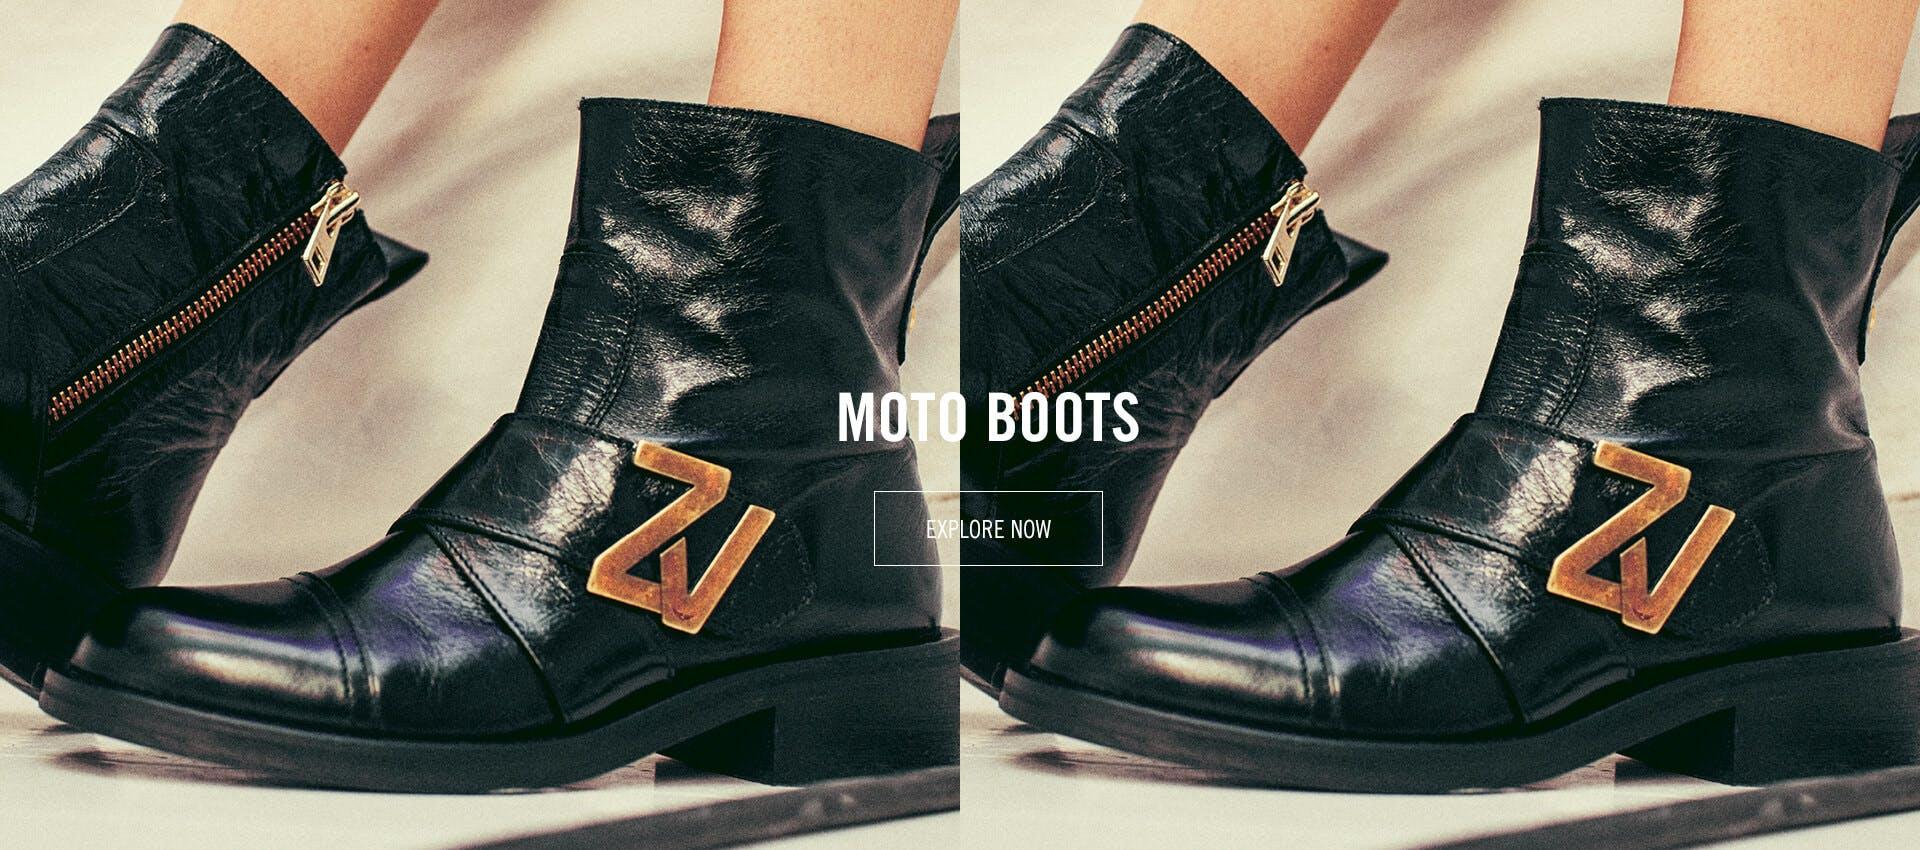 Moto Boots January 2021